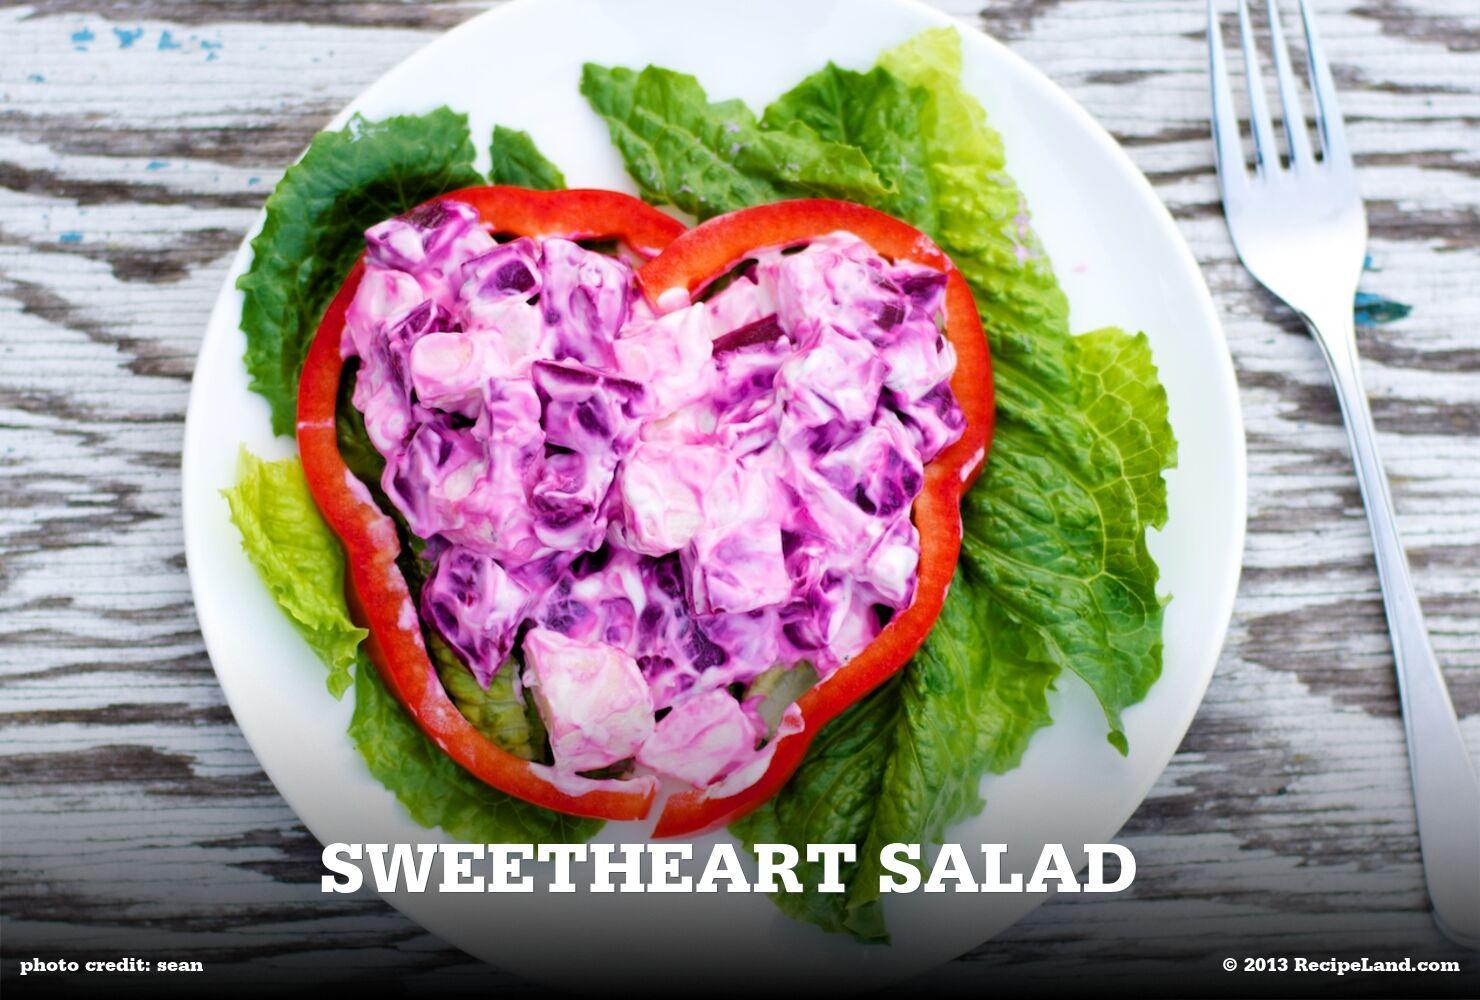 Sweetheart Salad